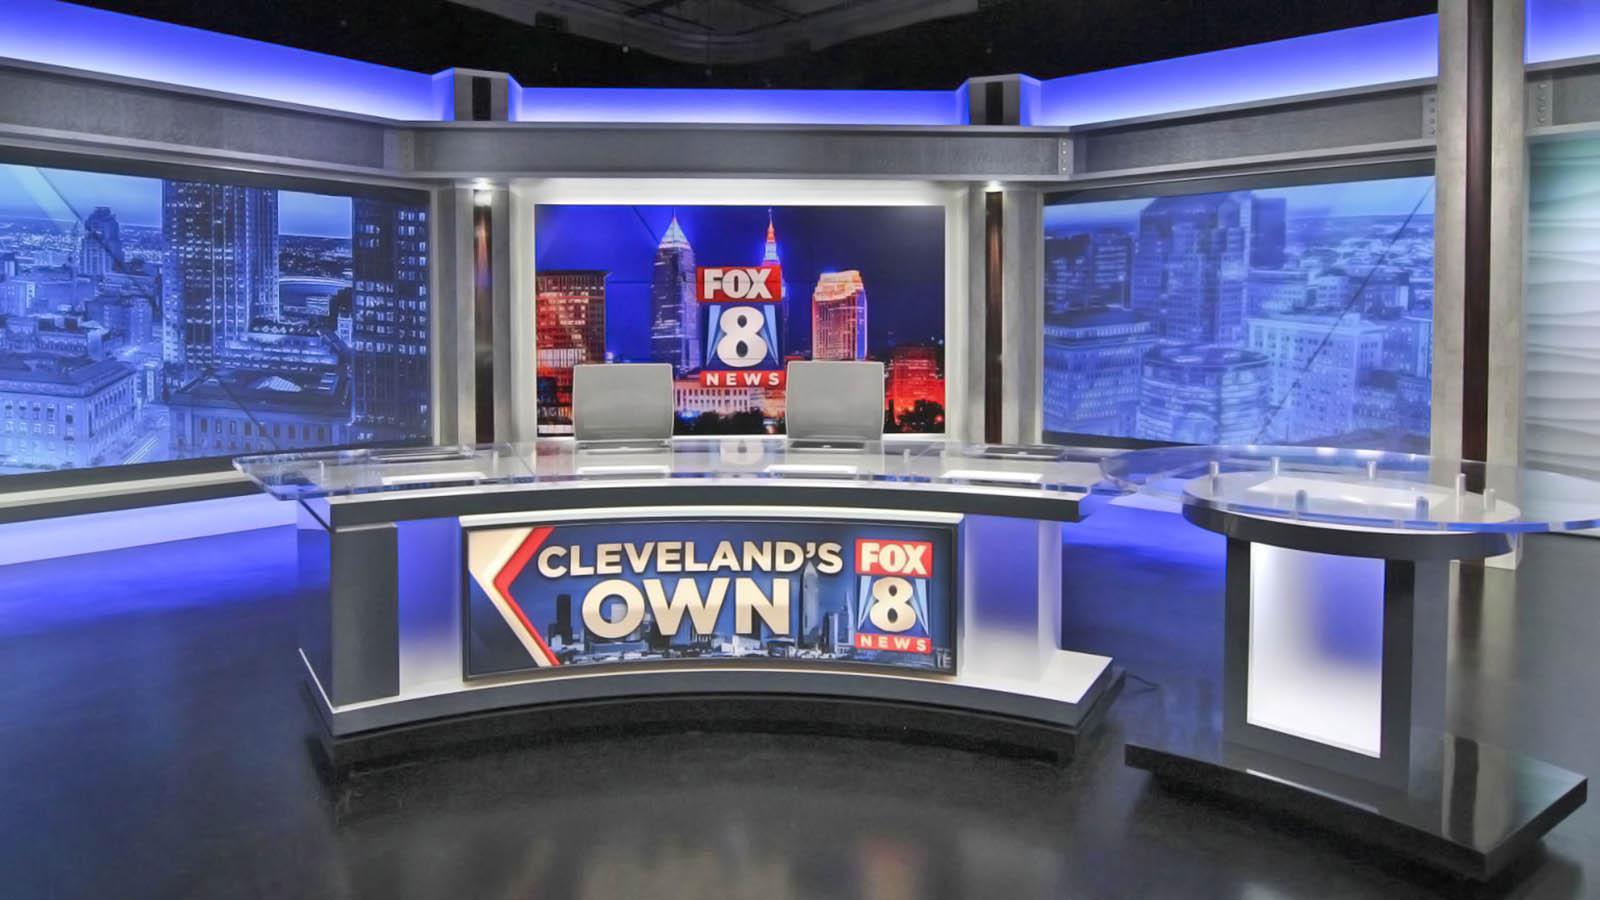 Fox 8 News Cleveland live coverage studio